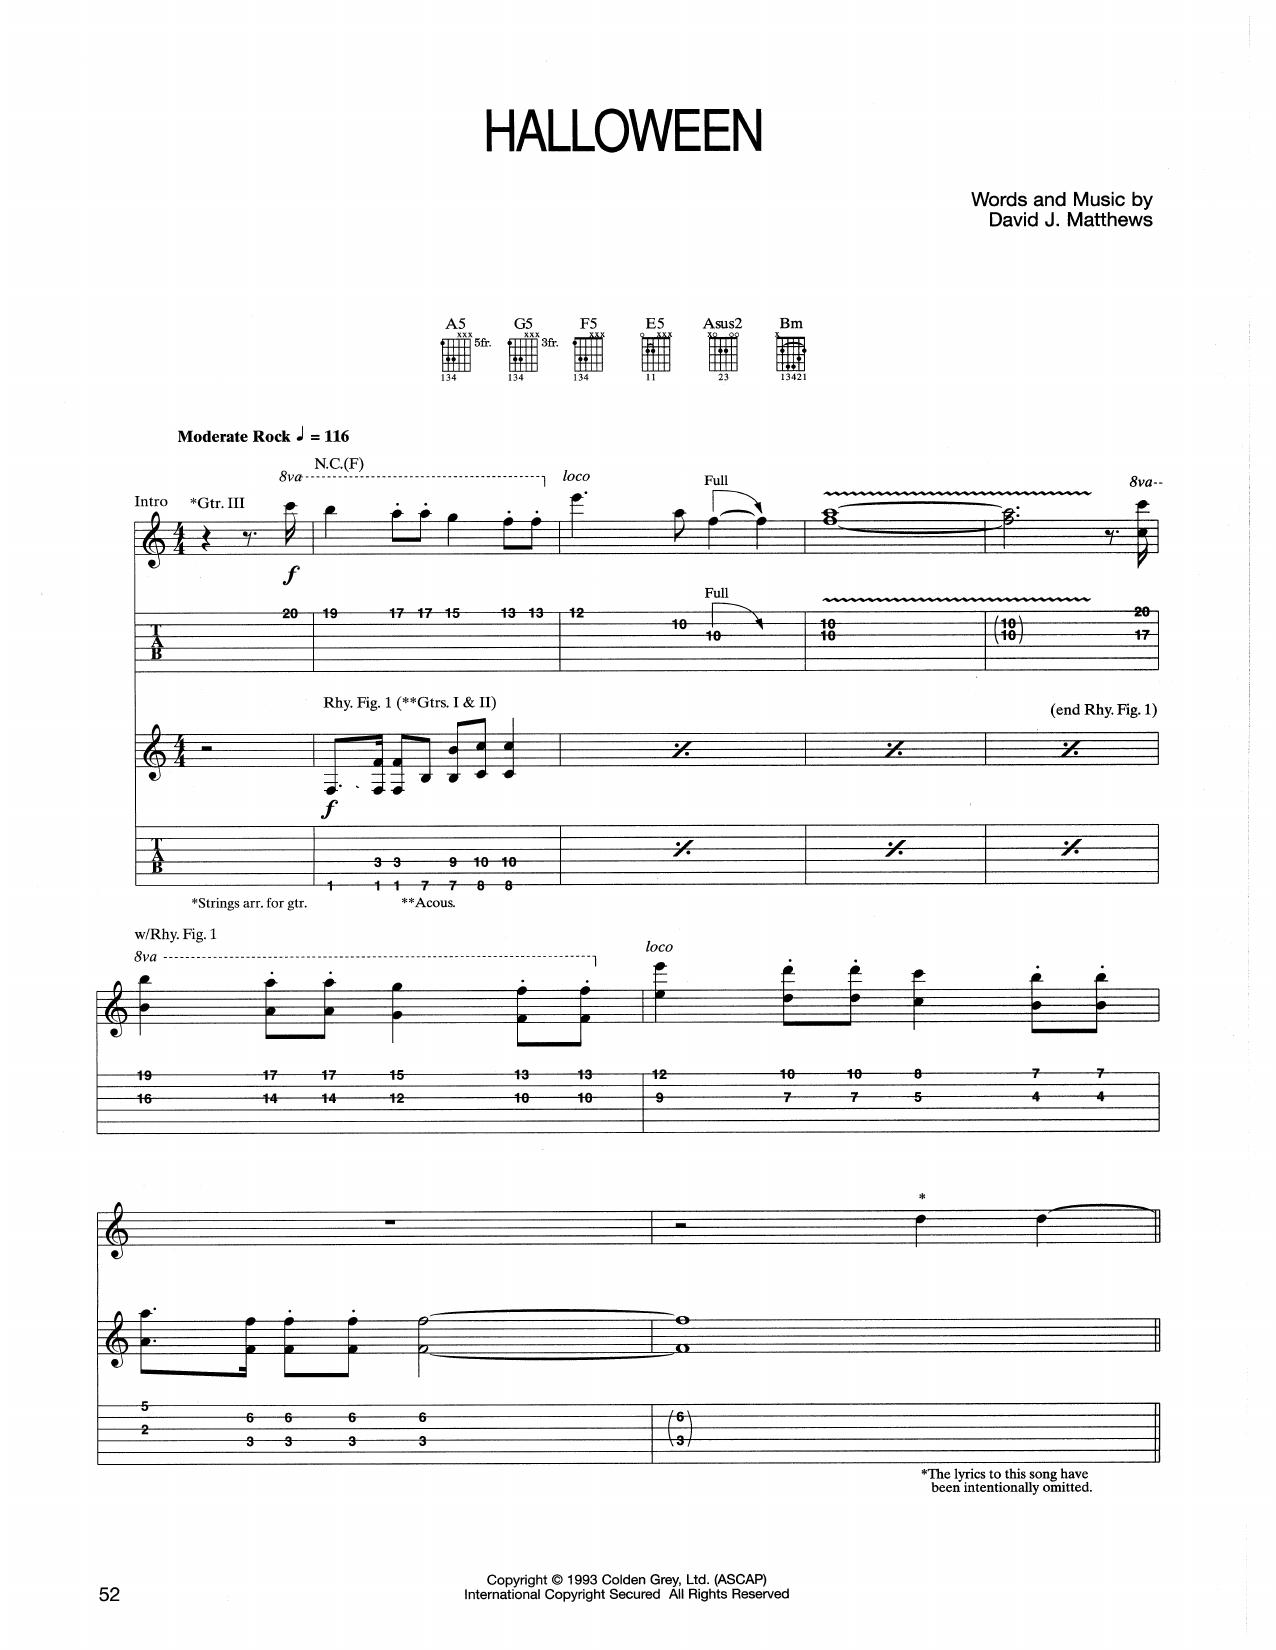 dave matthews band halloween guitar tab sheet music piano notes chords